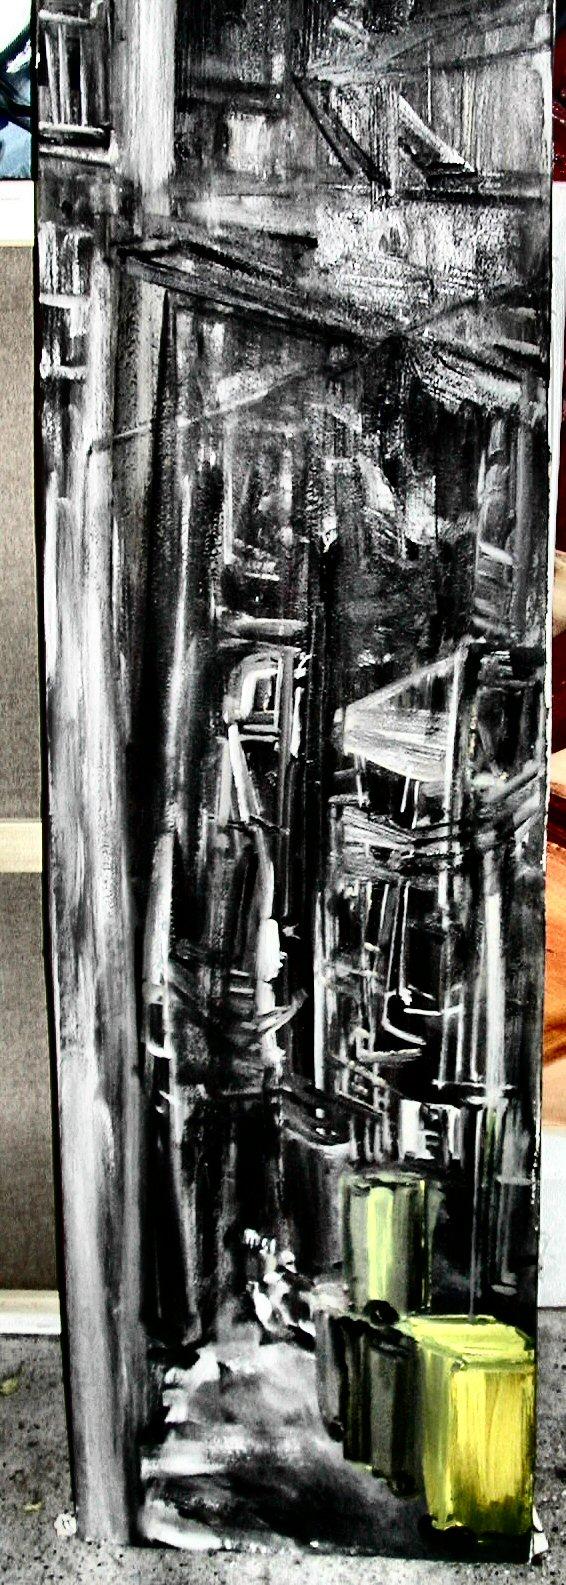 28_blocco a hong kong_olio su tela cm 60x230